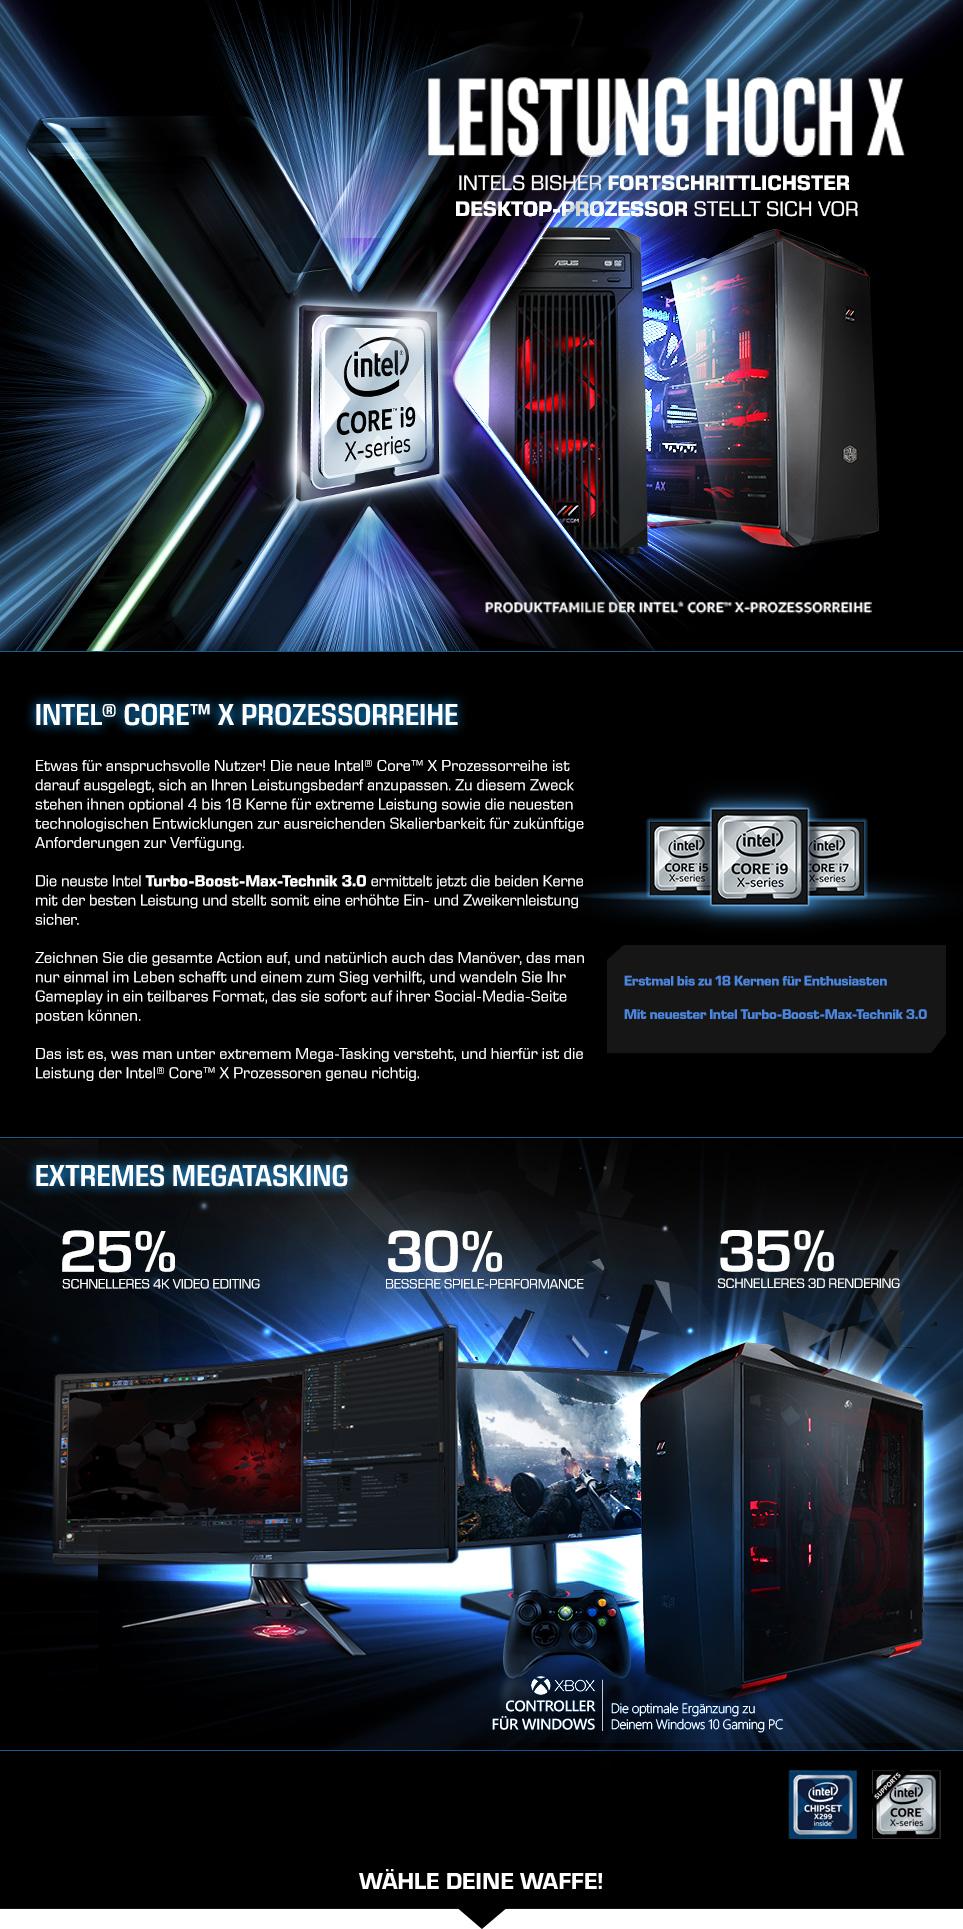 Gaming PCs mit Intel Core X-Prozessoren